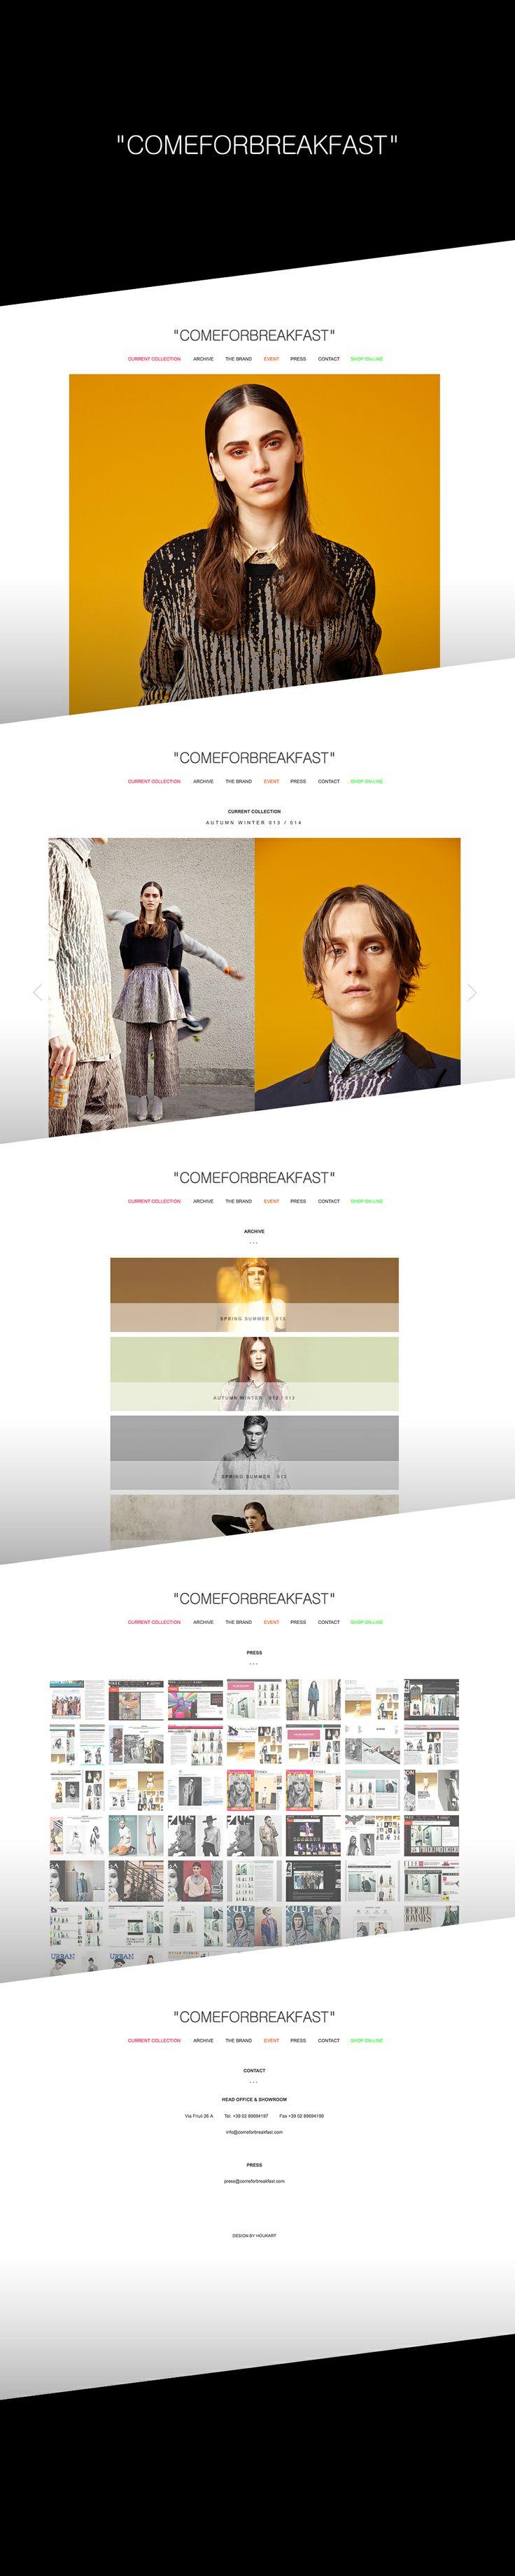 """comeforbreakfast"" / Web Design 2013  DESIGN BY HOUKART http://www.houkart.com #Design #Houkart #Web #Comeforbreakfast"